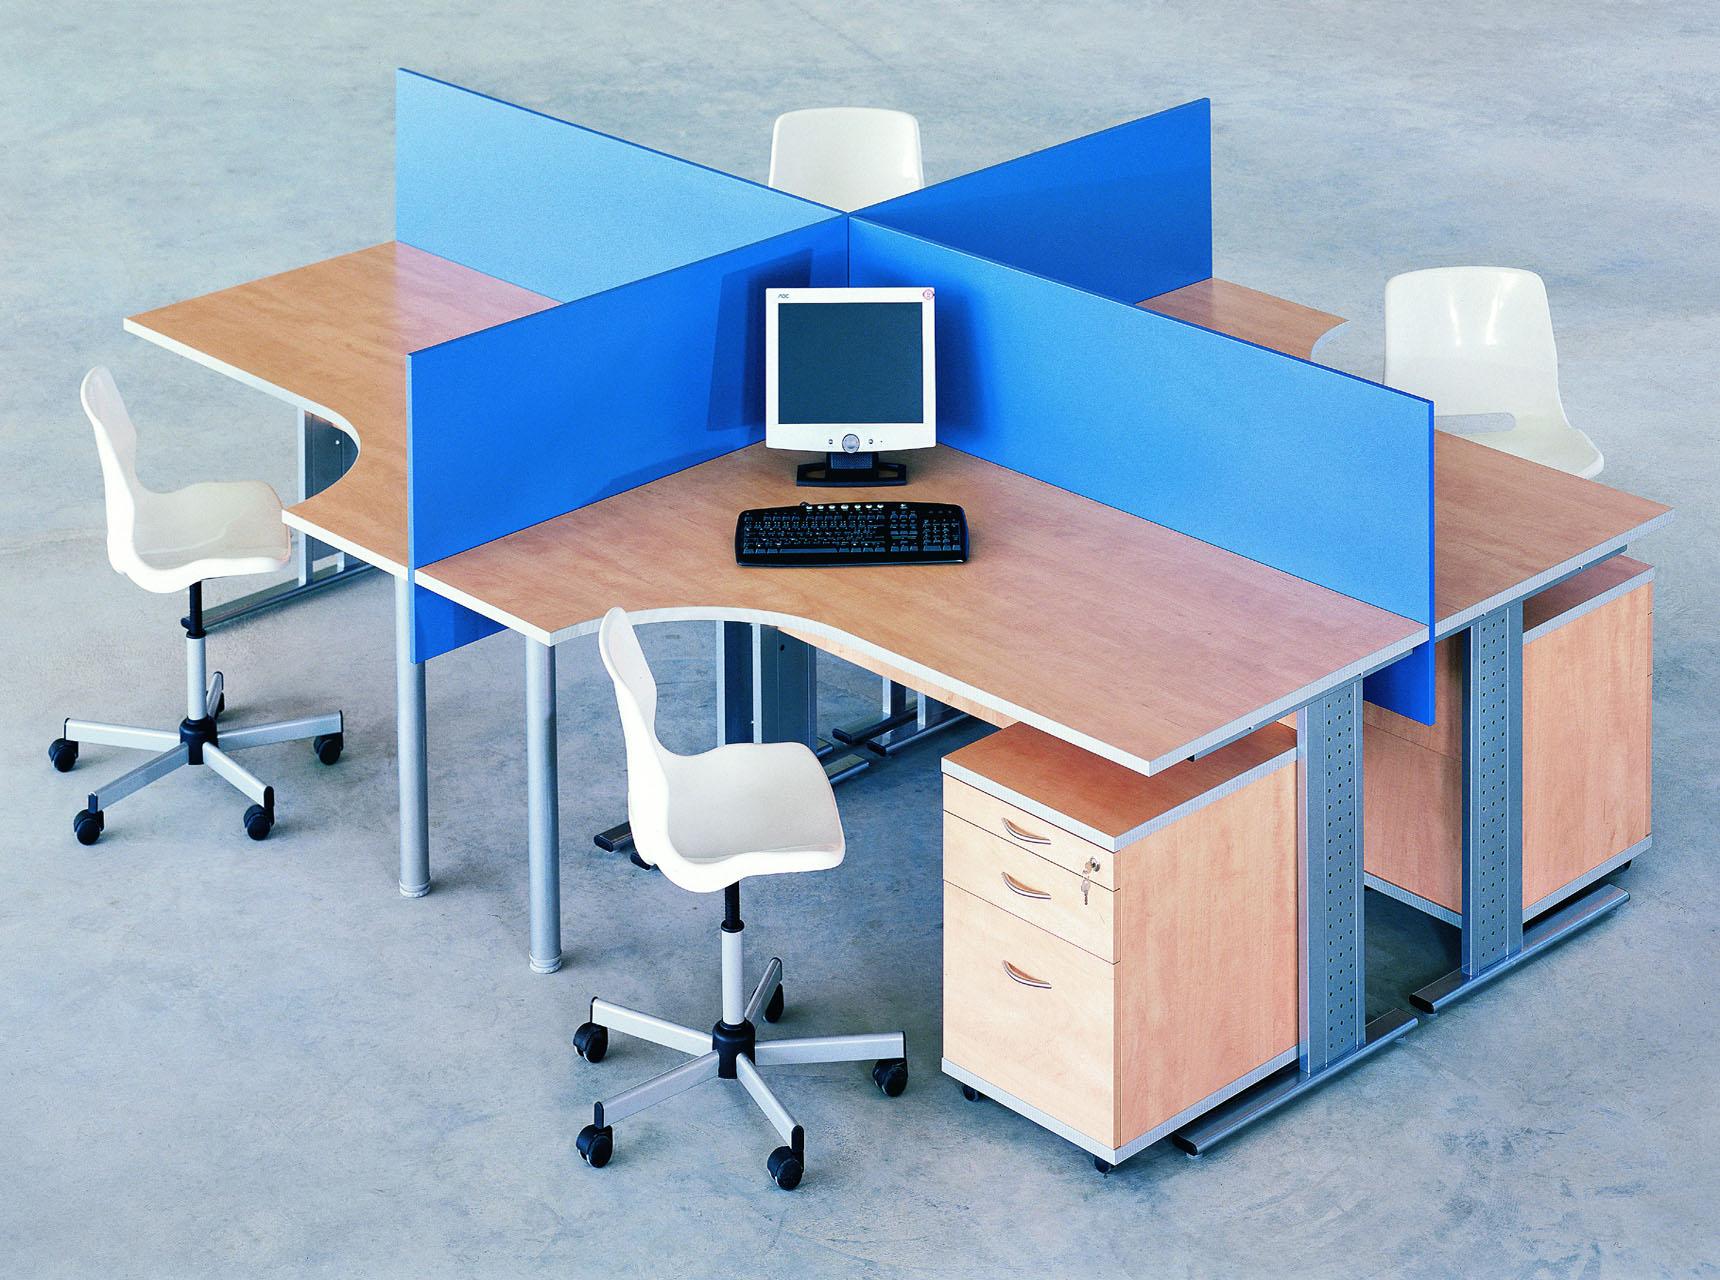 kancelarsky-stul-basic02.jpg